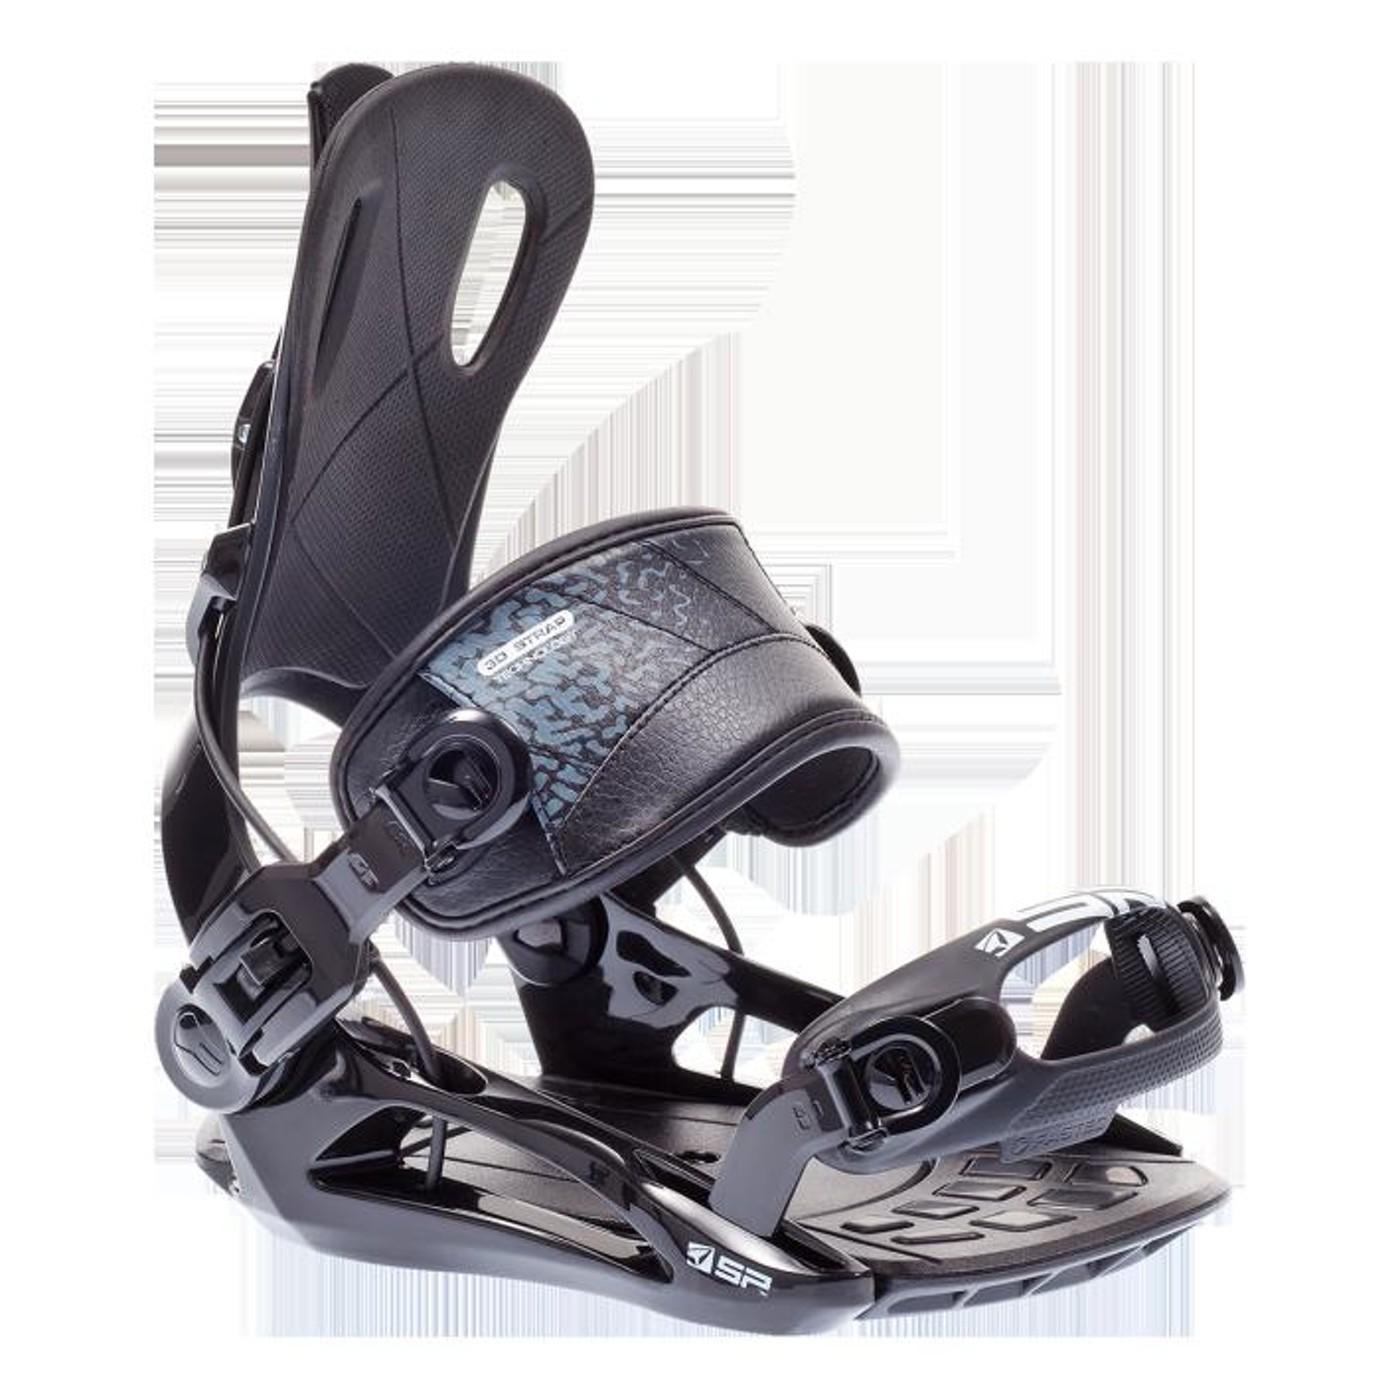 SNOW PRO Bindung Snowboard SP FT 270